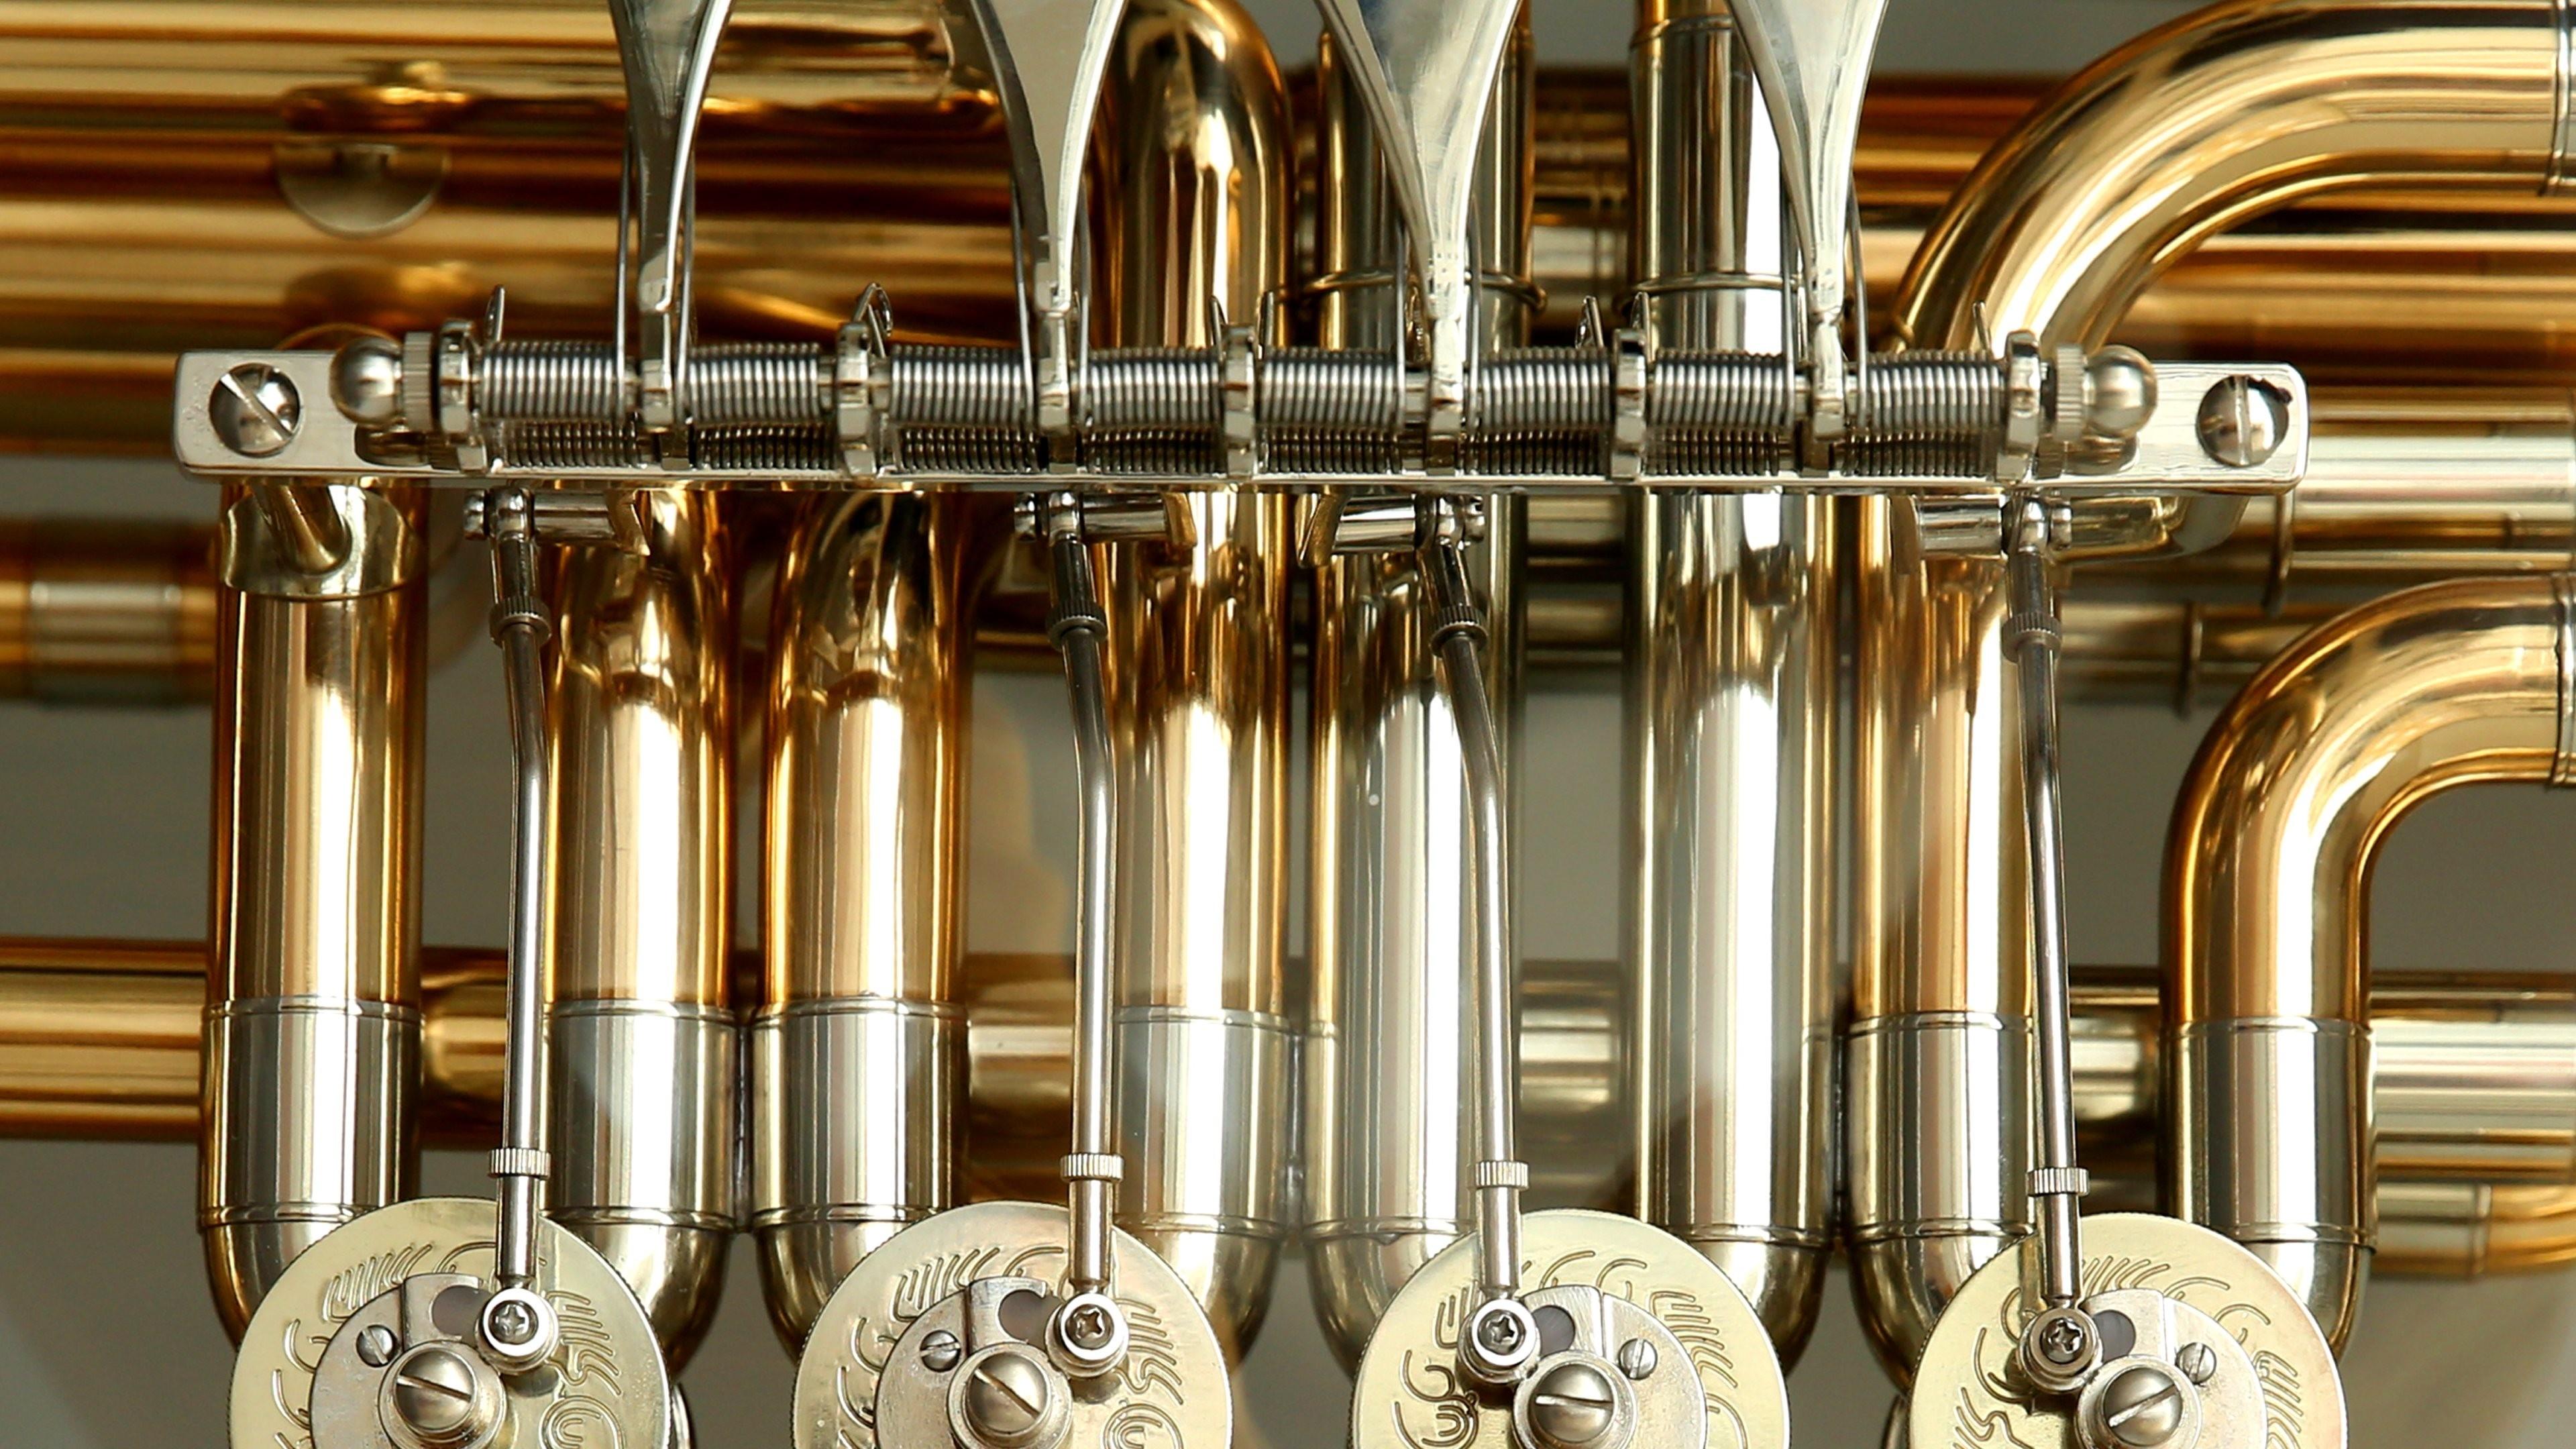 tuba up close wallpaper background 63204